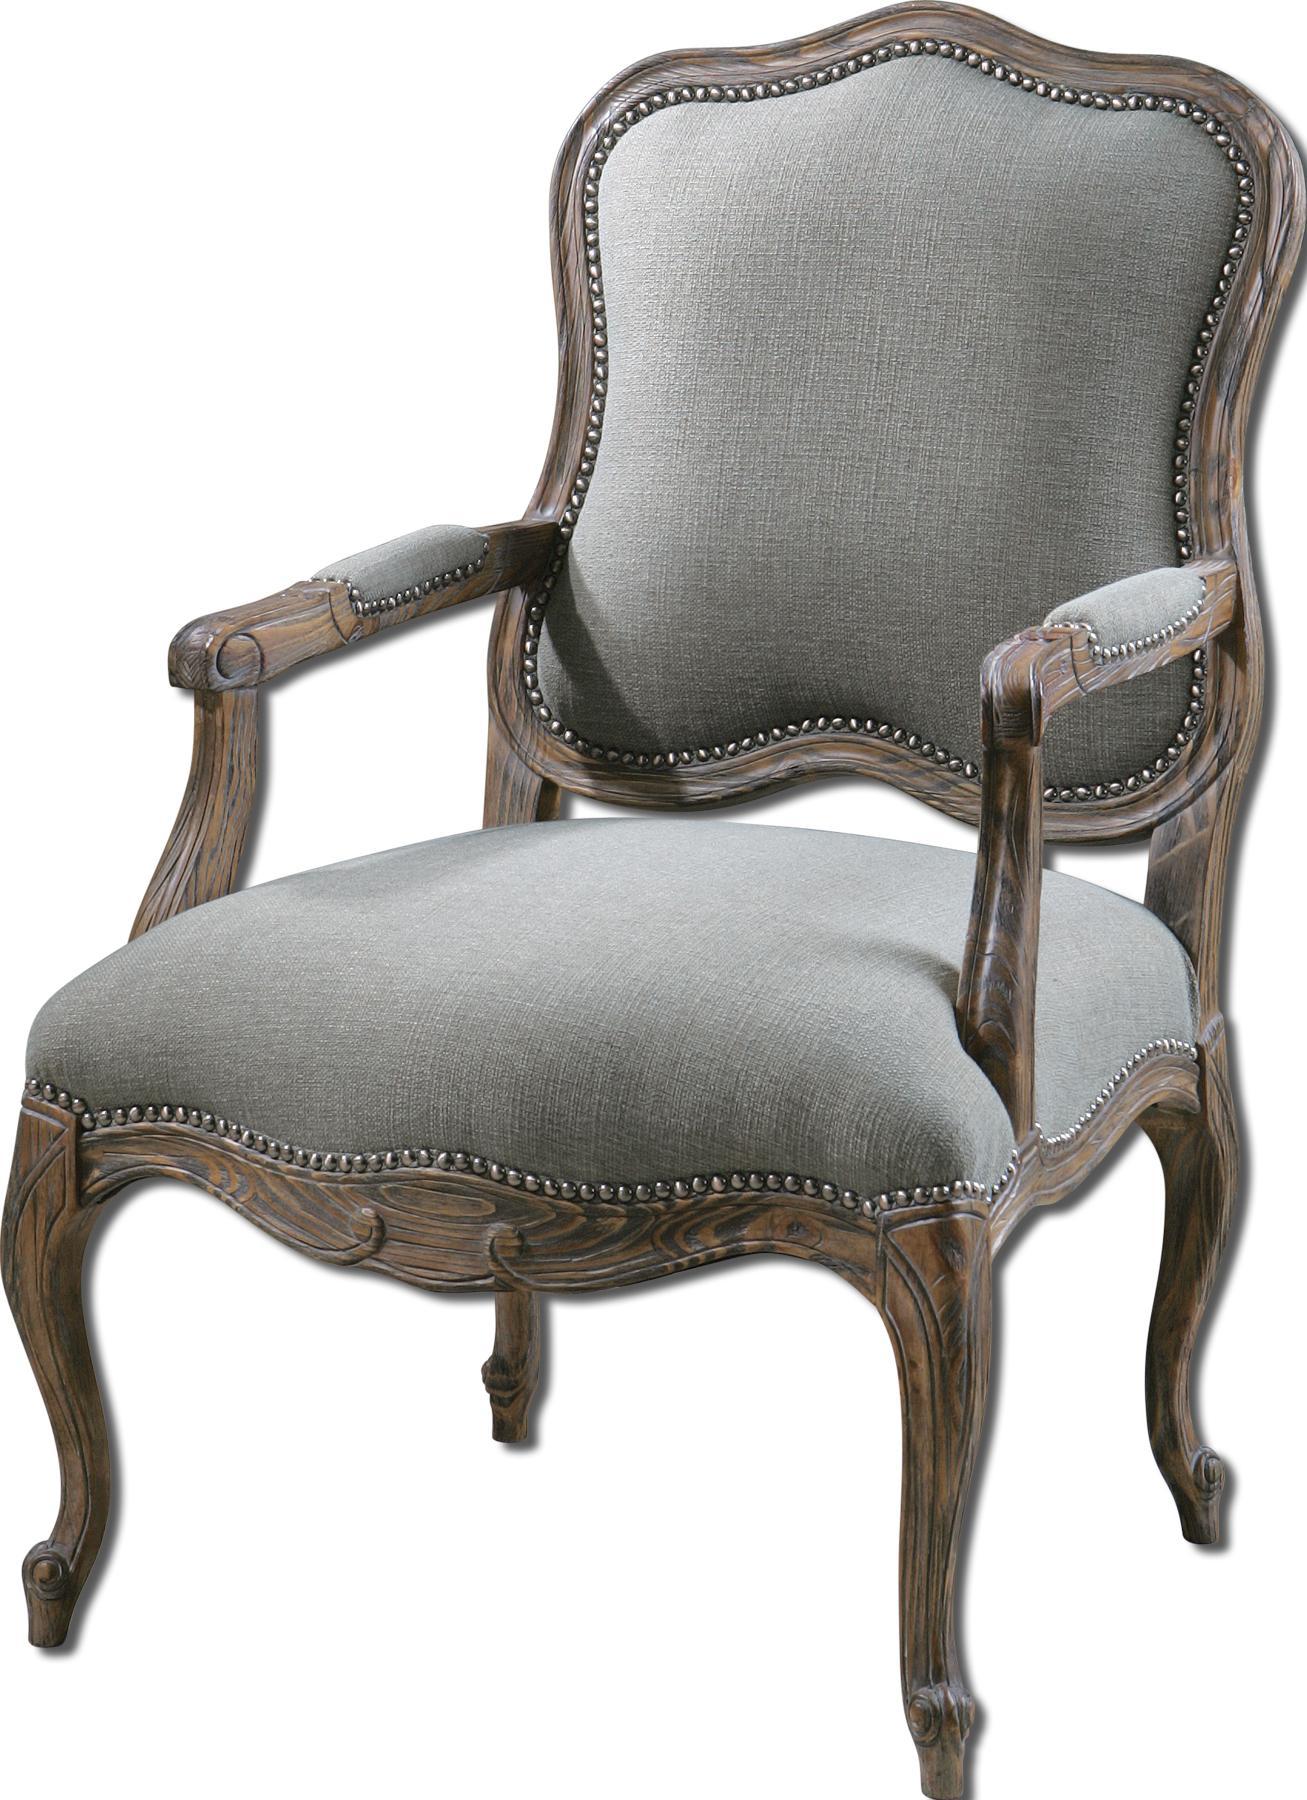 Uttermost Accent Furniture Willa Armchair - Item Number: 23095